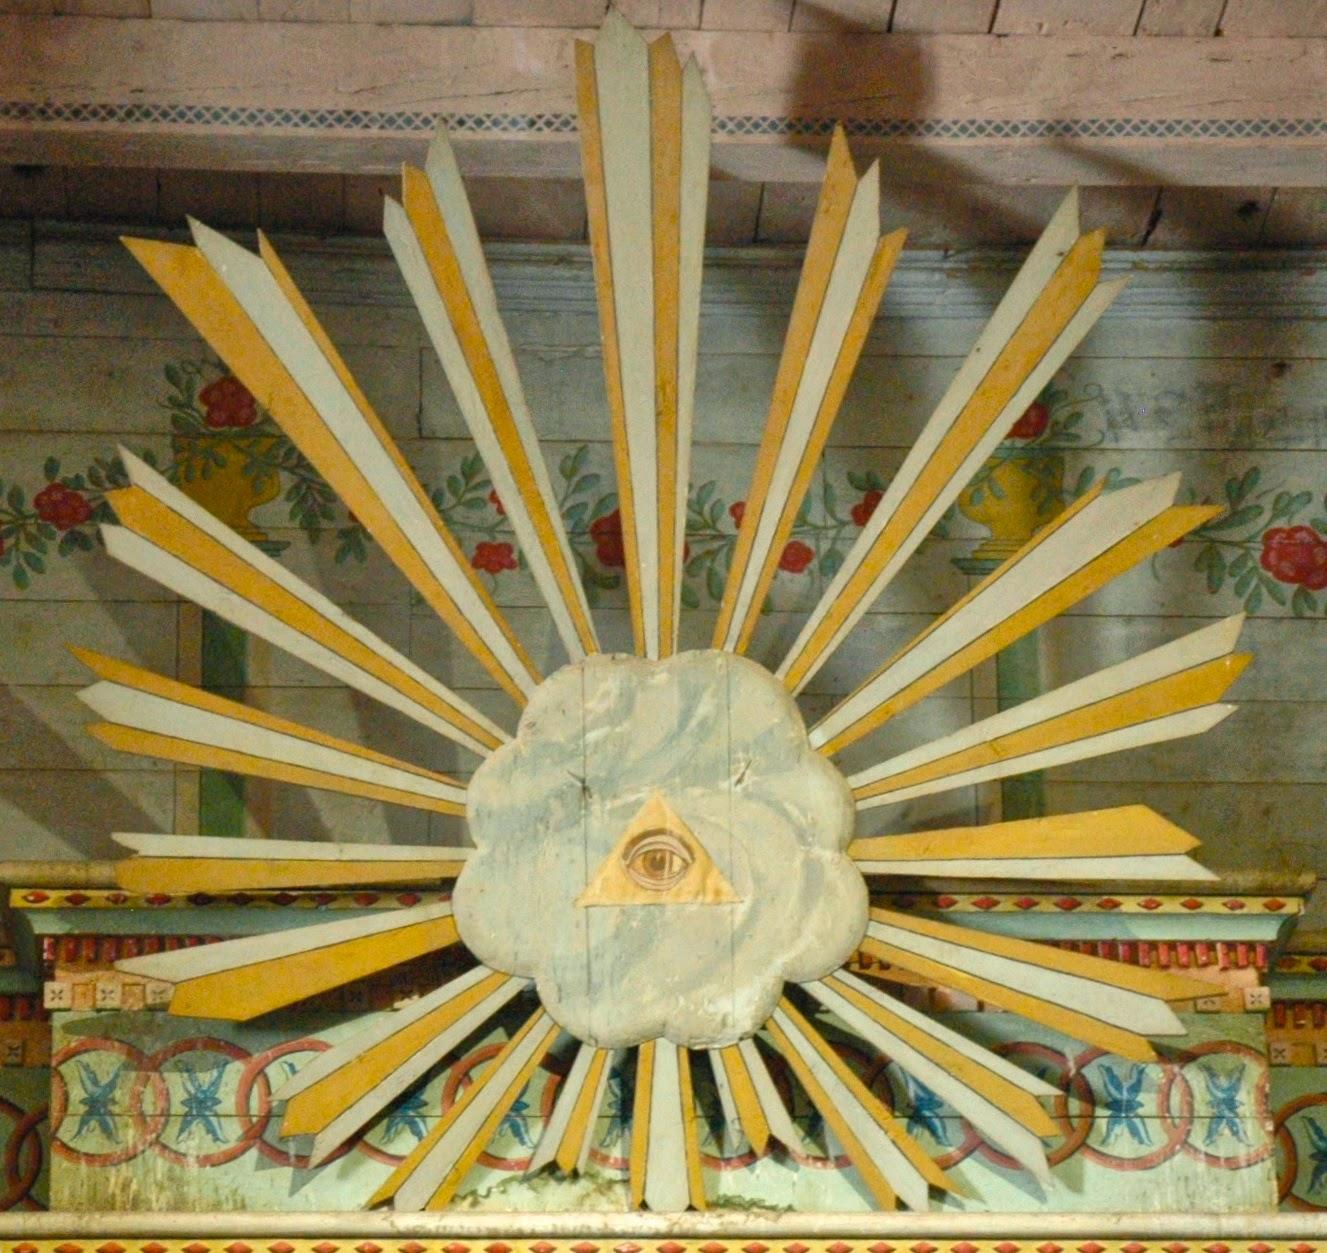 http://catholicmom.com/2013/10/12/man-on-a-mission-mission-san-miguel-archangel/